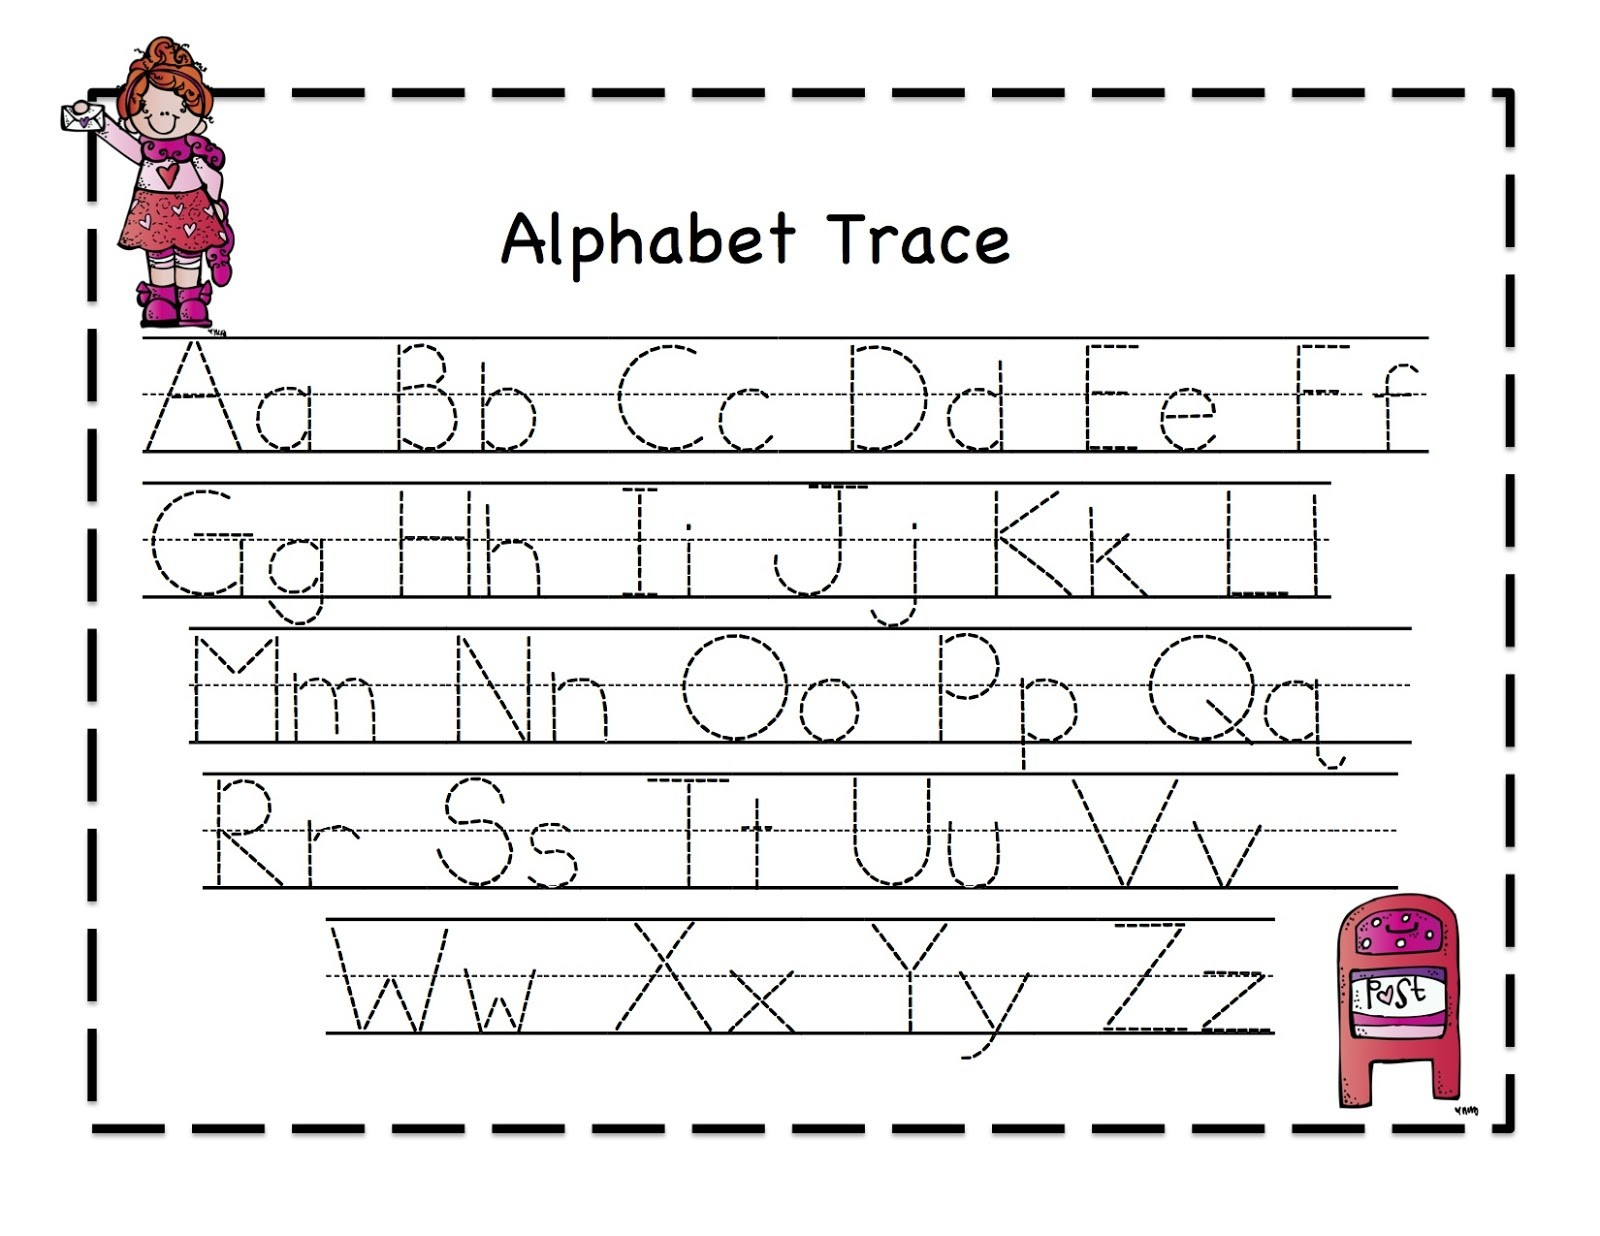 Free Alphabet Tracing Worksheets Free Printable Preschool Worksheets - Free Printable Tracing Alphabet Worksheets